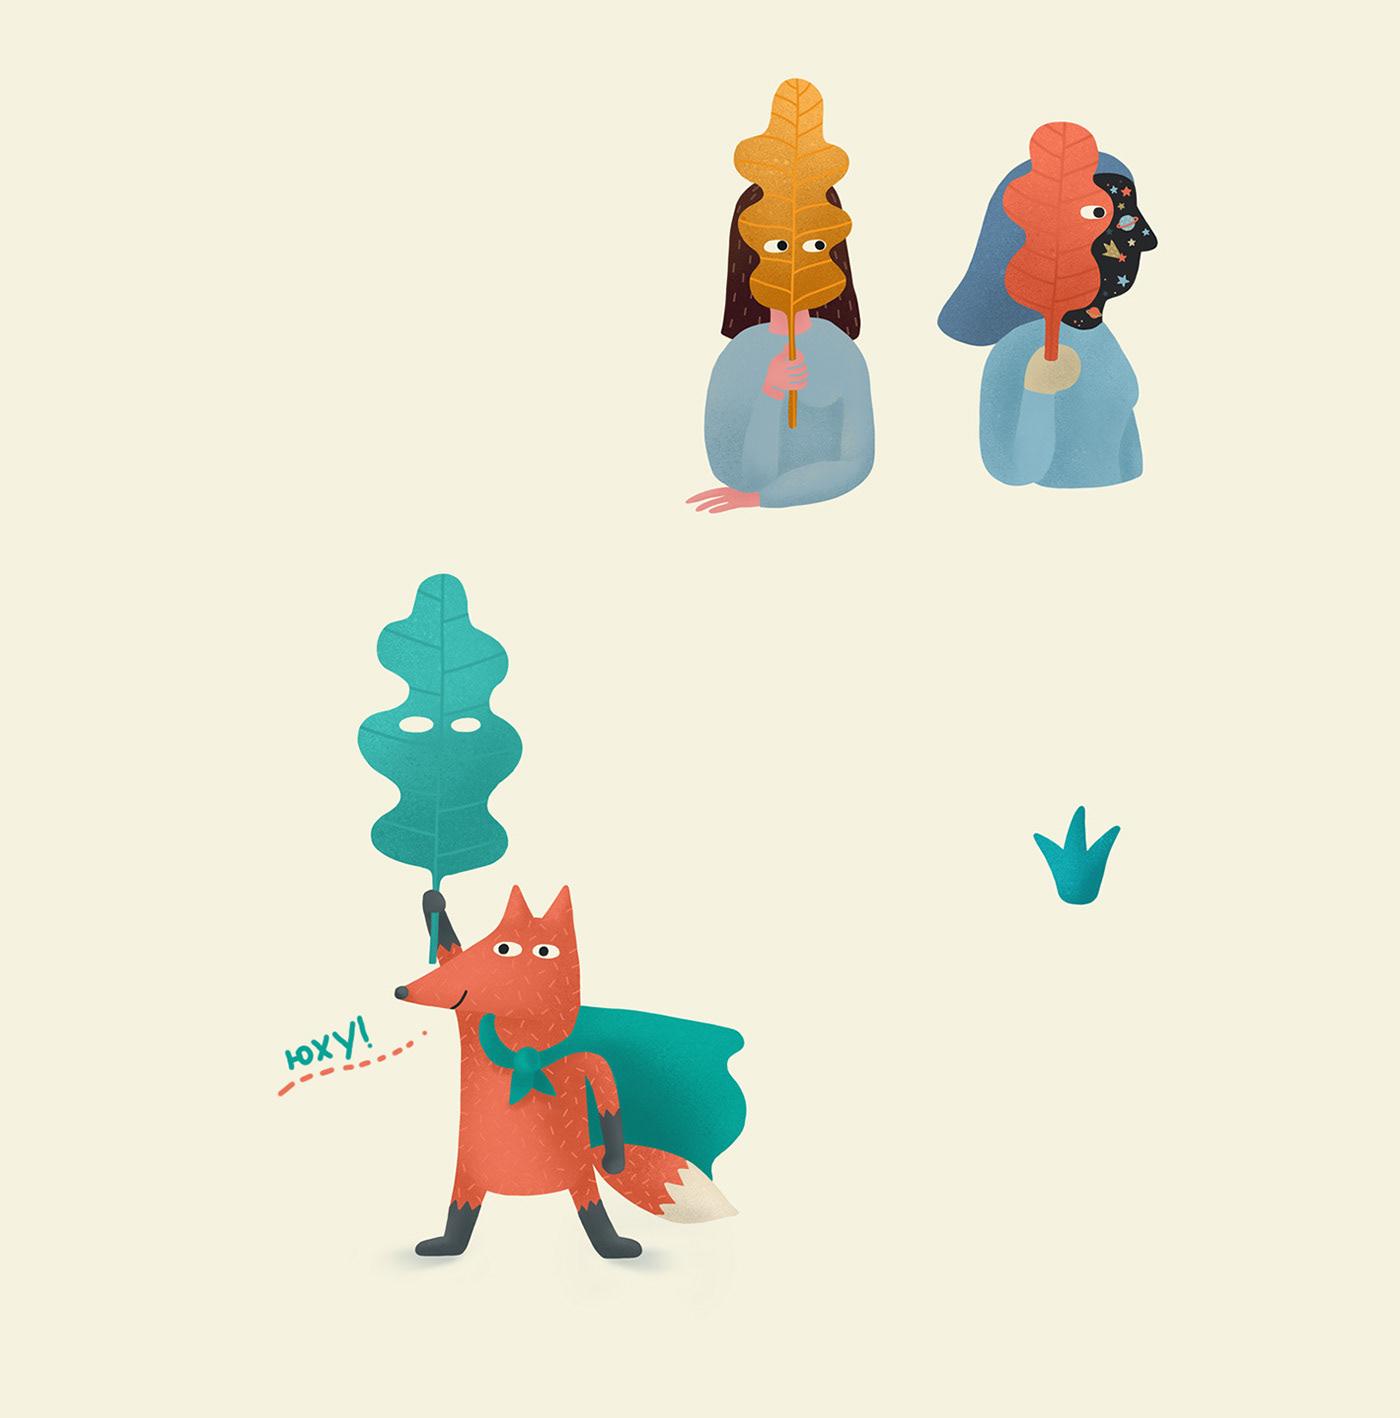 animal bear golf rabbit leaf forest ninadz dzivulskyi letter Introvert